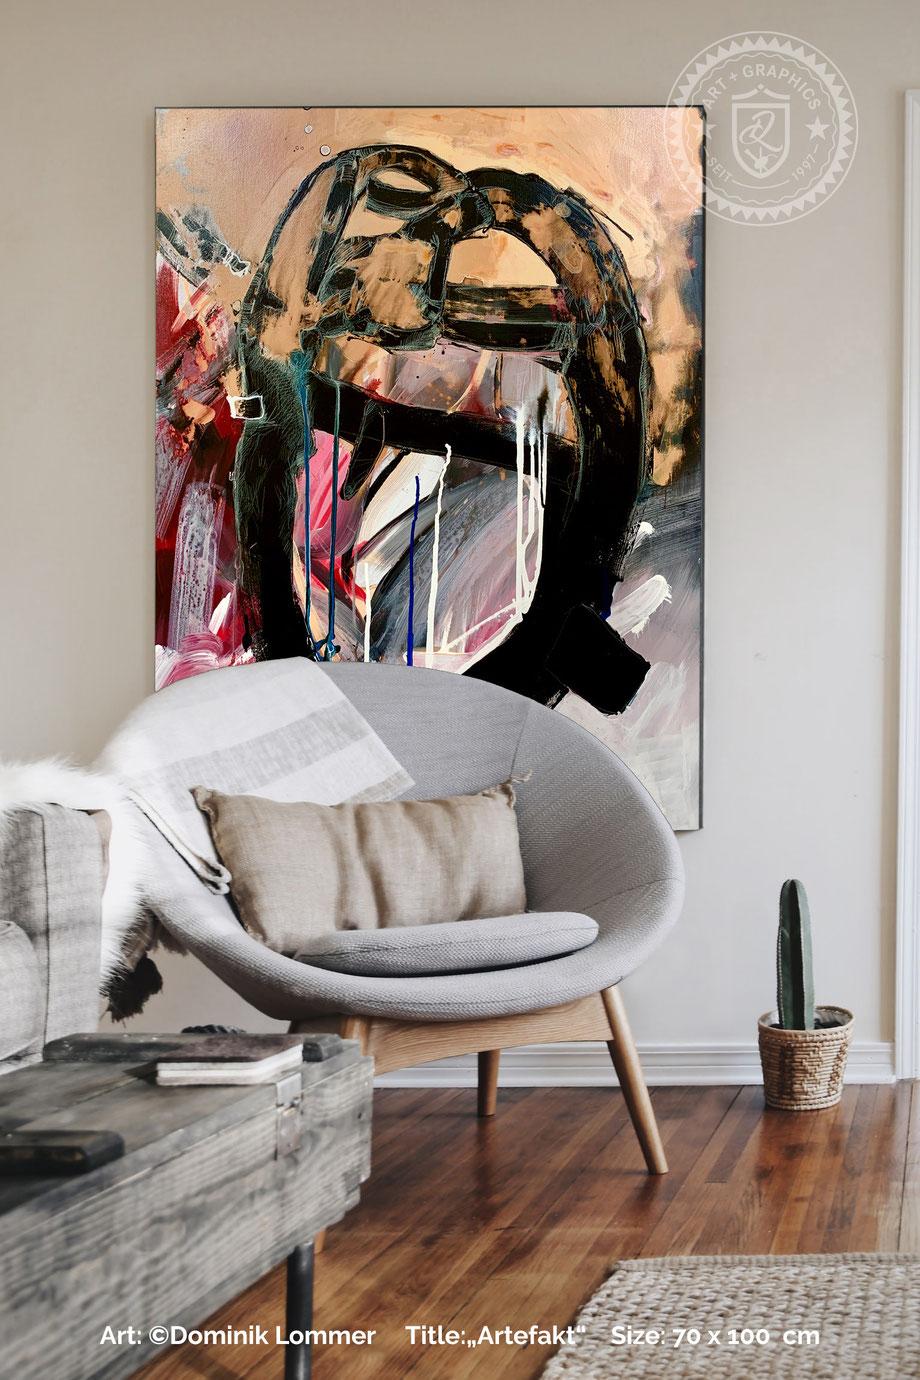 acryl-bilder-gemaelde-hochformat-bohemian-style-abstrakte-kunst-bilder-rot-gold-artefact